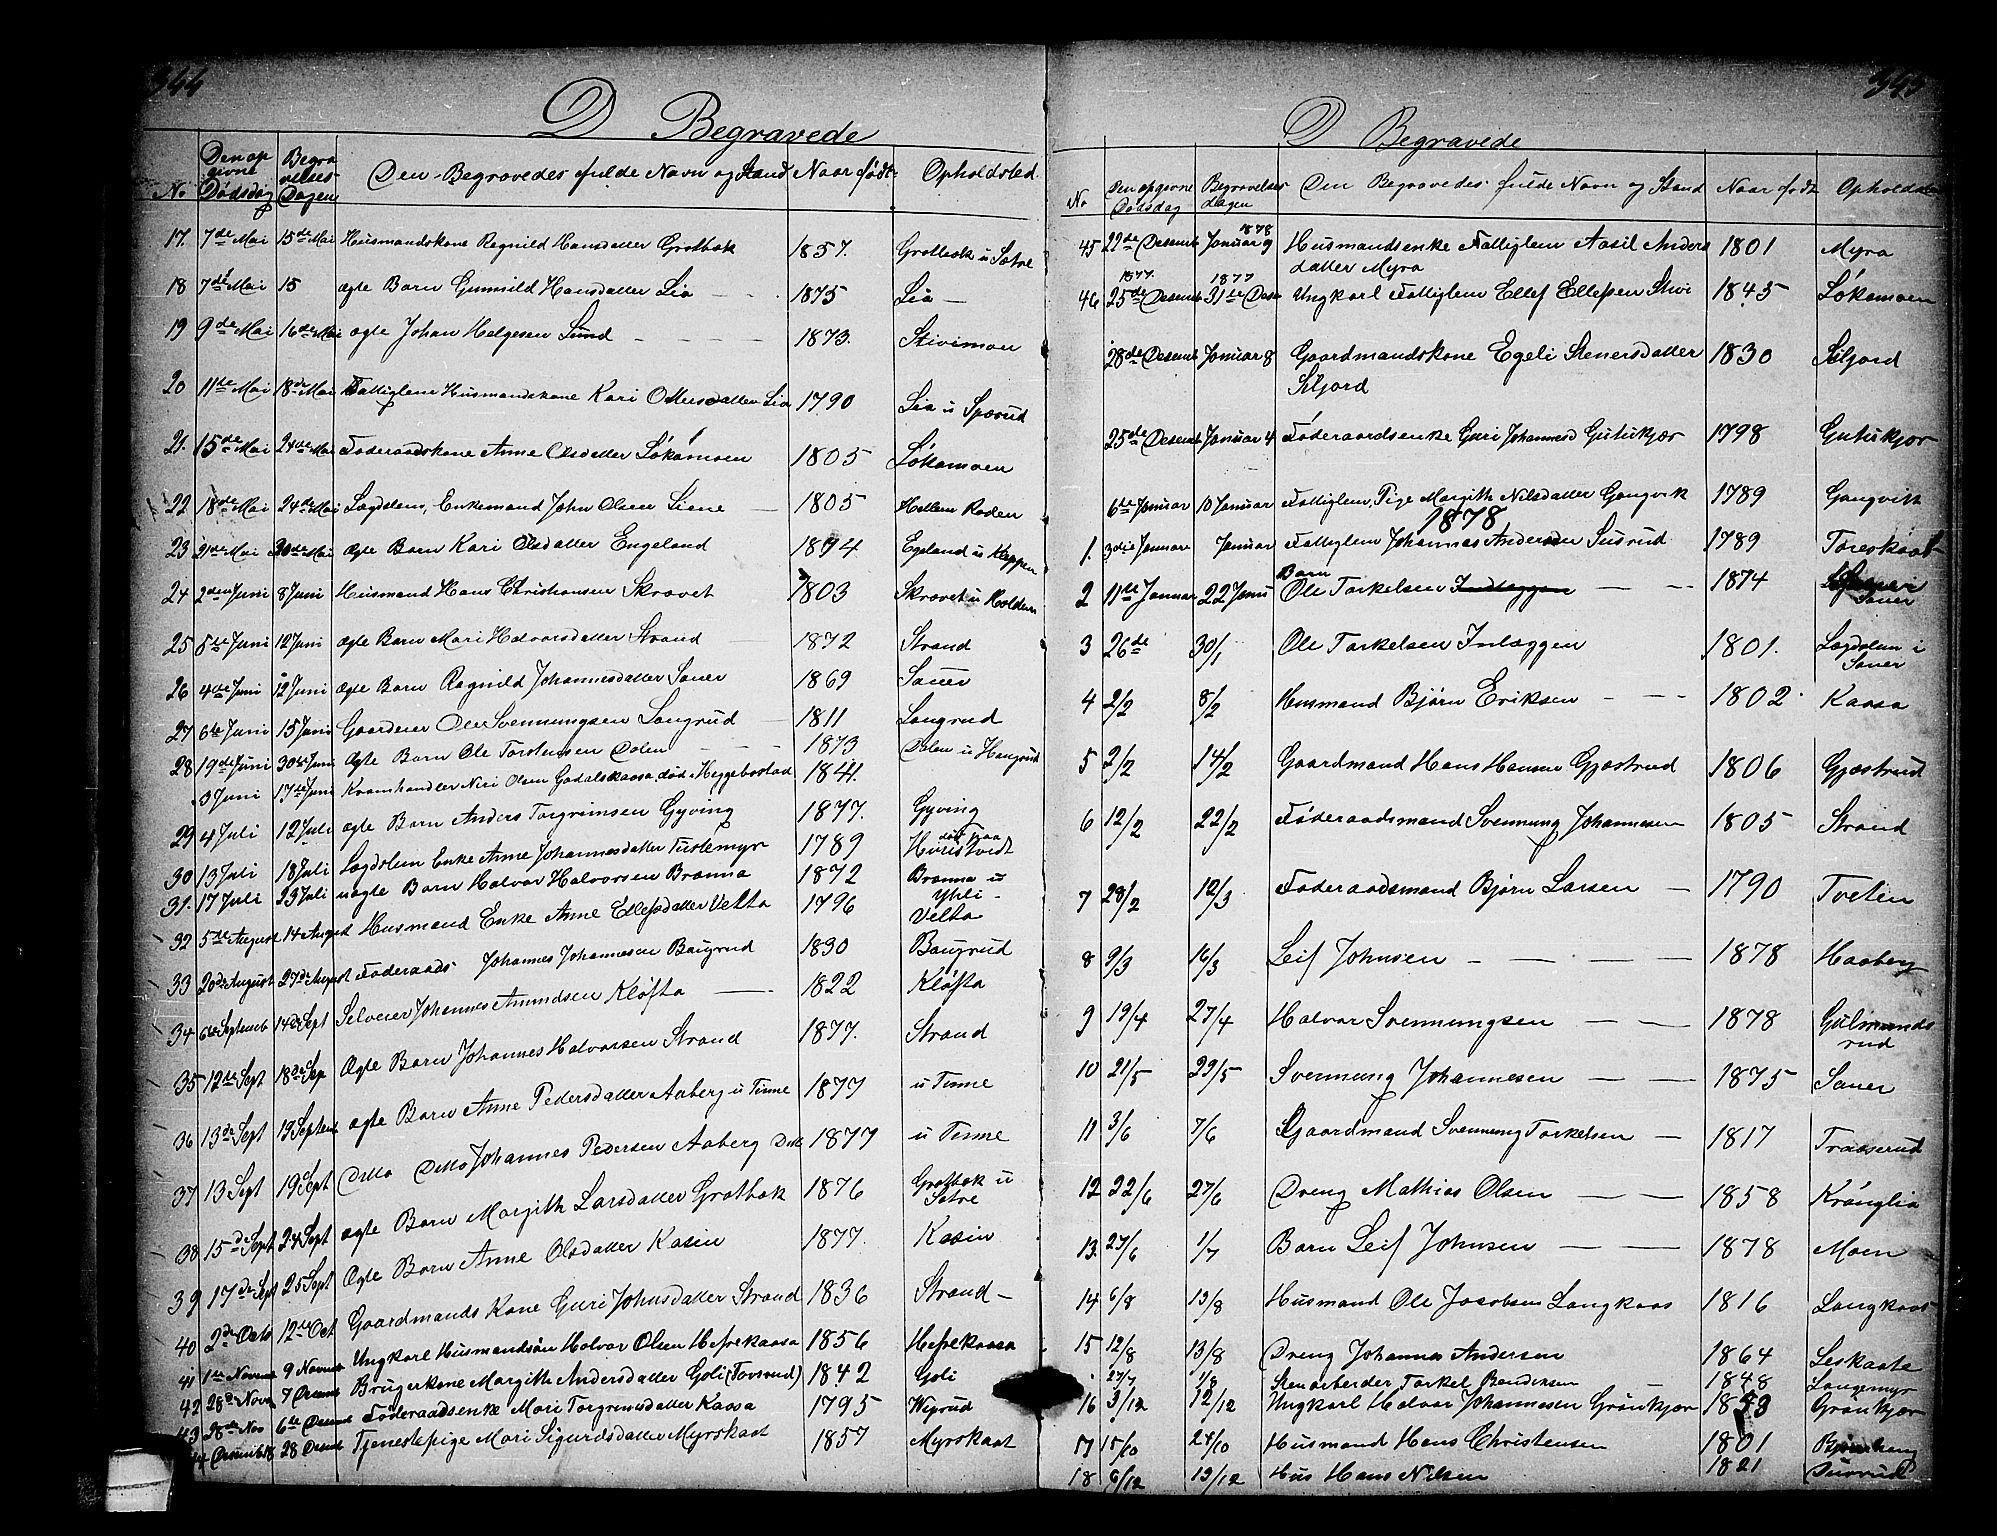 SAKO, Heddal kirkebøker, G/Ga/L0001: Klokkerbok nr. I 1, 1866-1878, s. 344-345